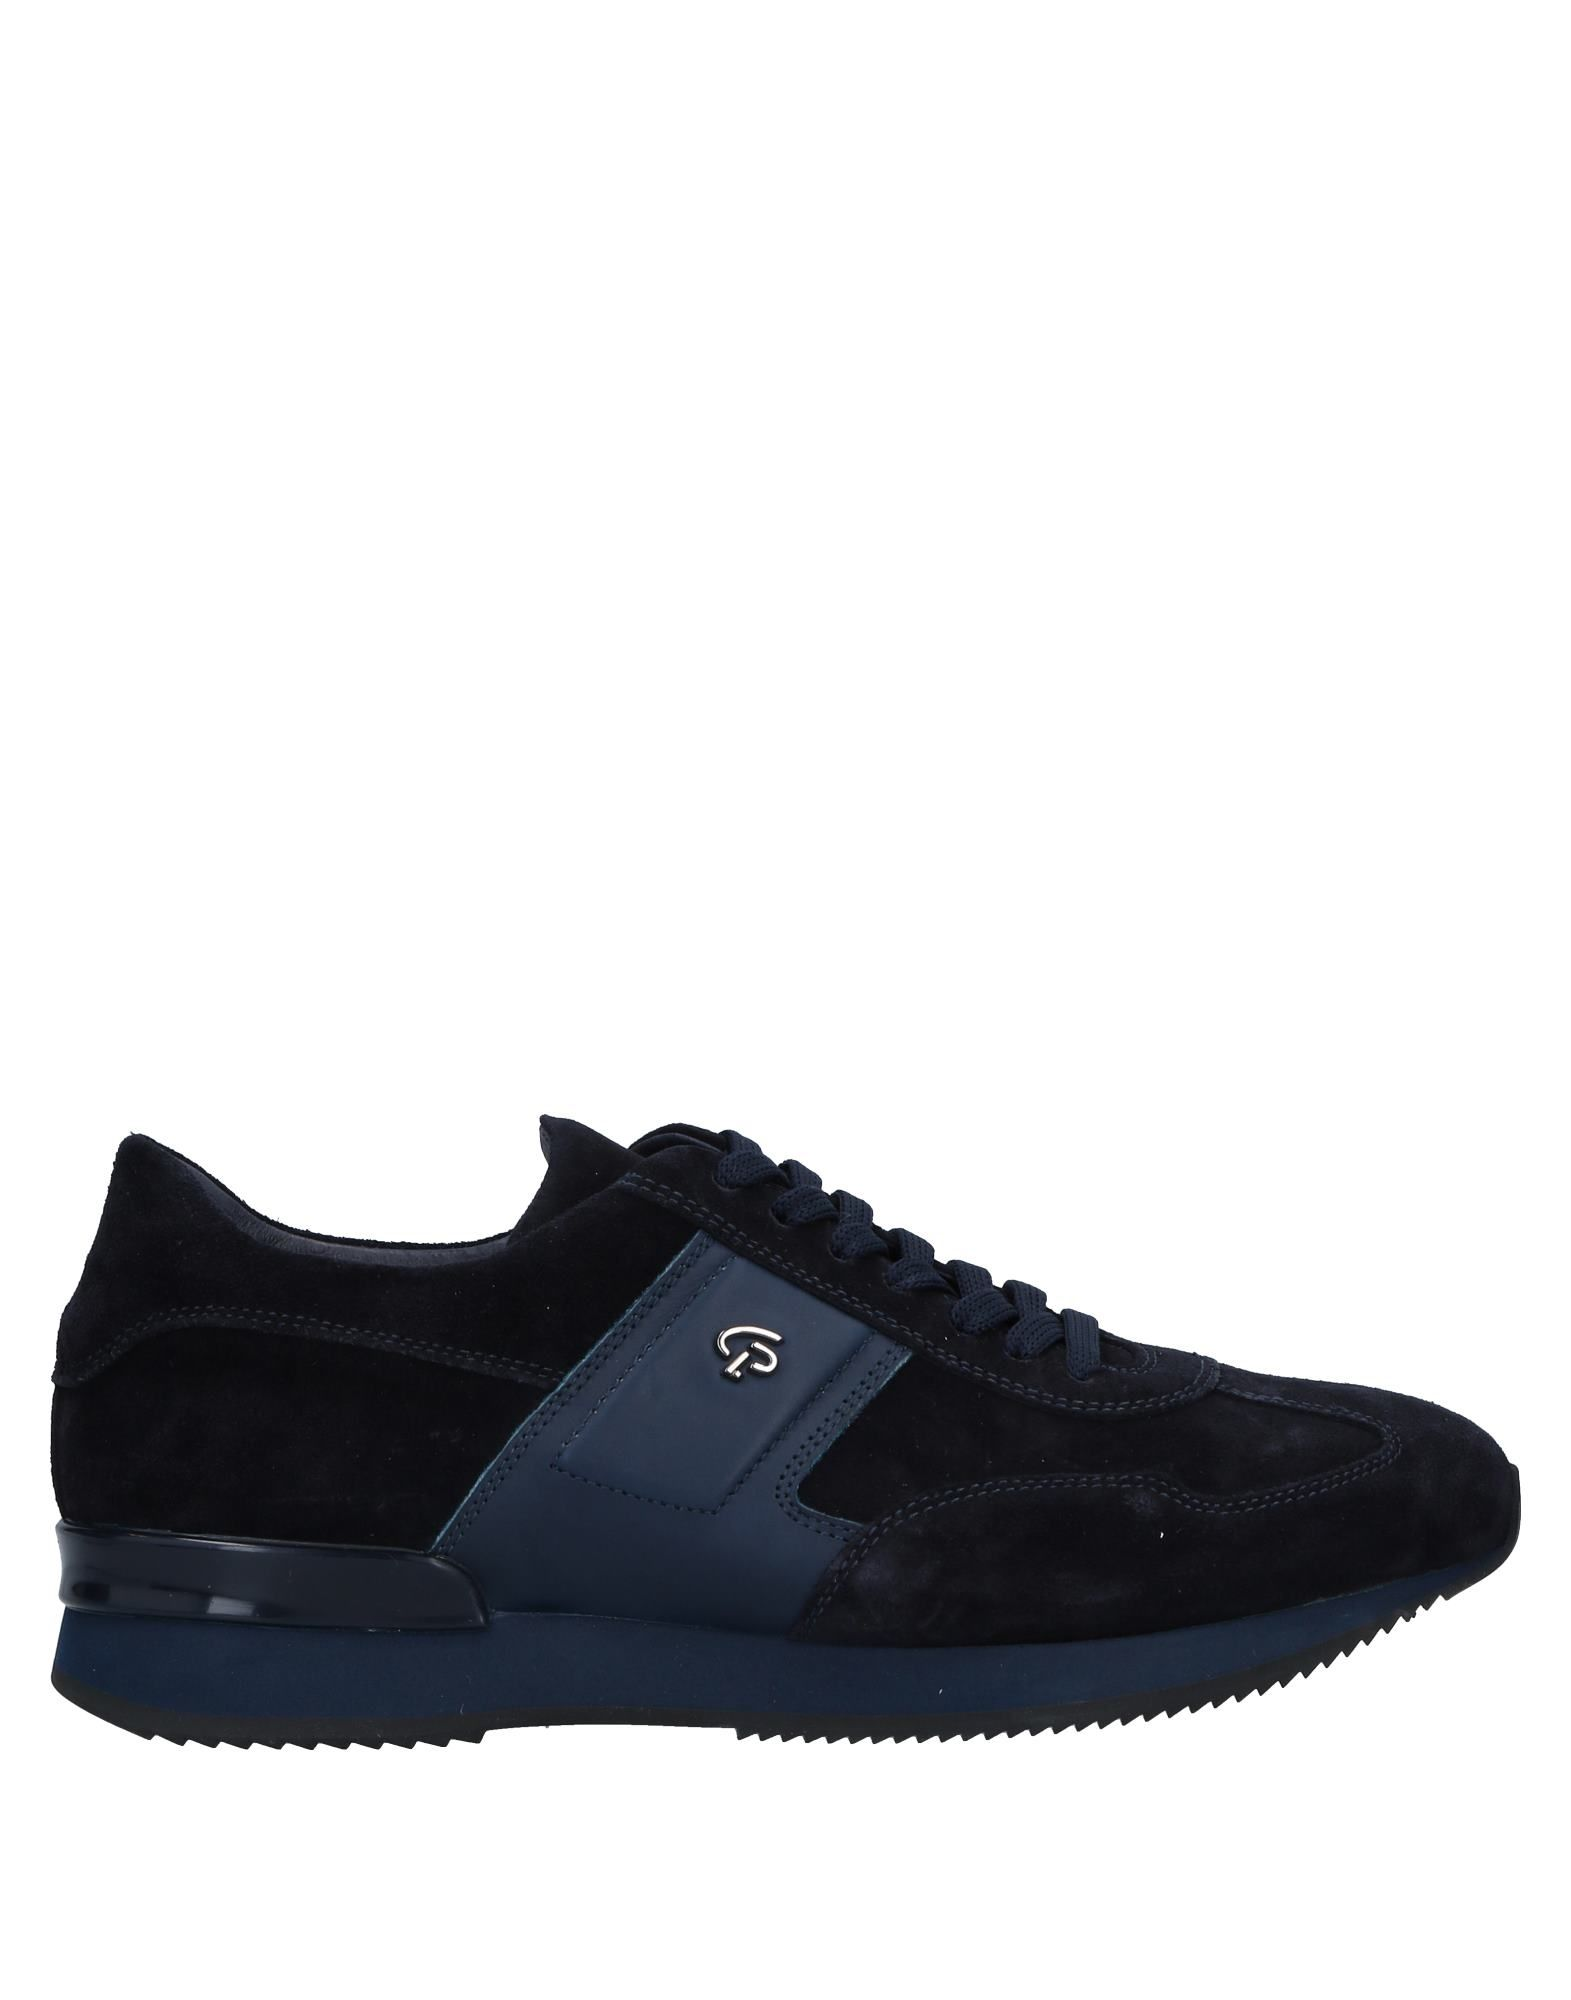 Cesare P. Sneakers - Men Cesare P. Sneakers - online on  Canada - Sneakers 11530392NR a0f3ea